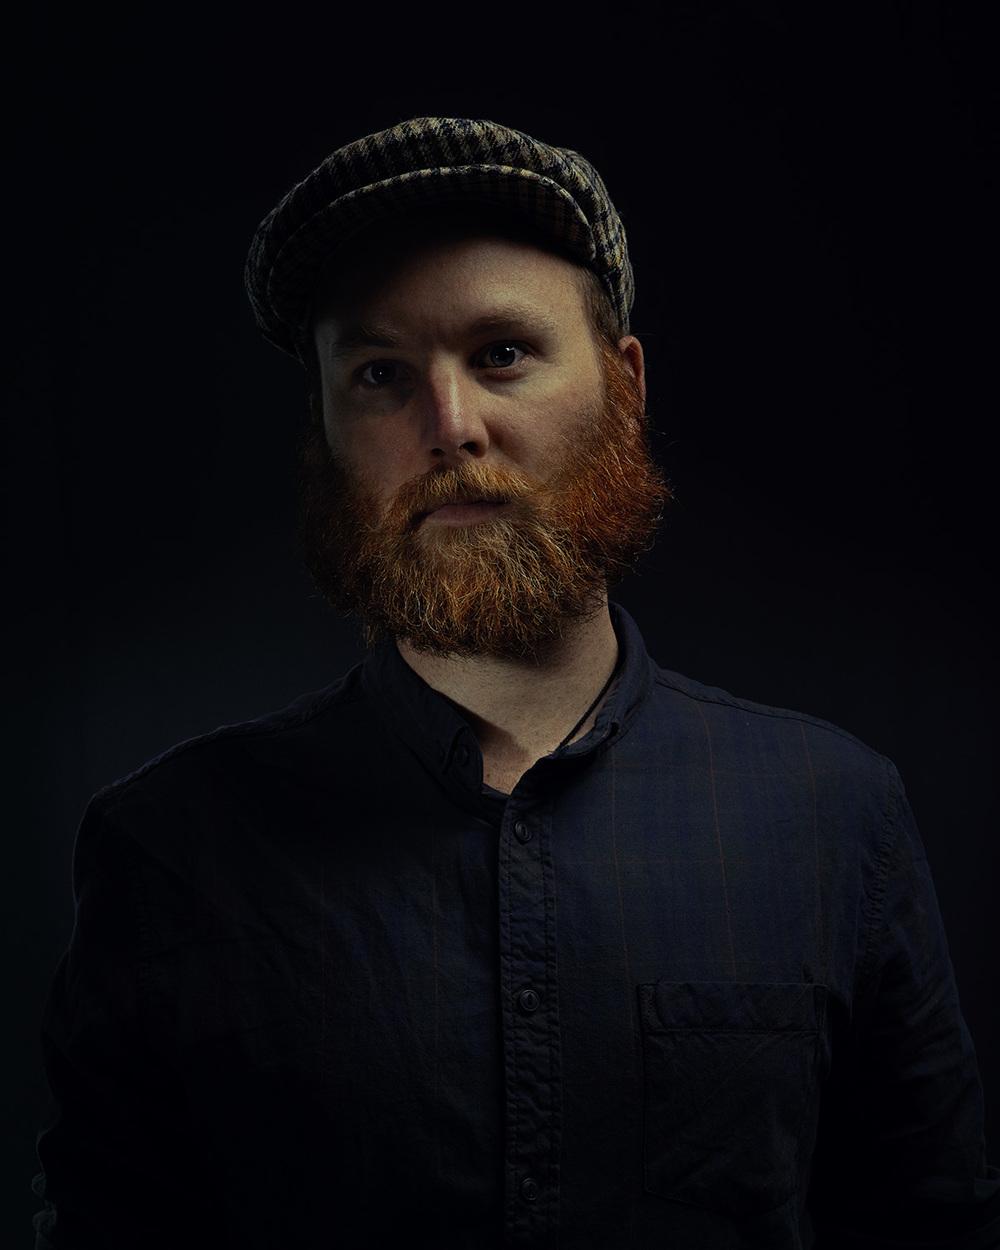 Gareth-White-Beard-Portrait.jpg